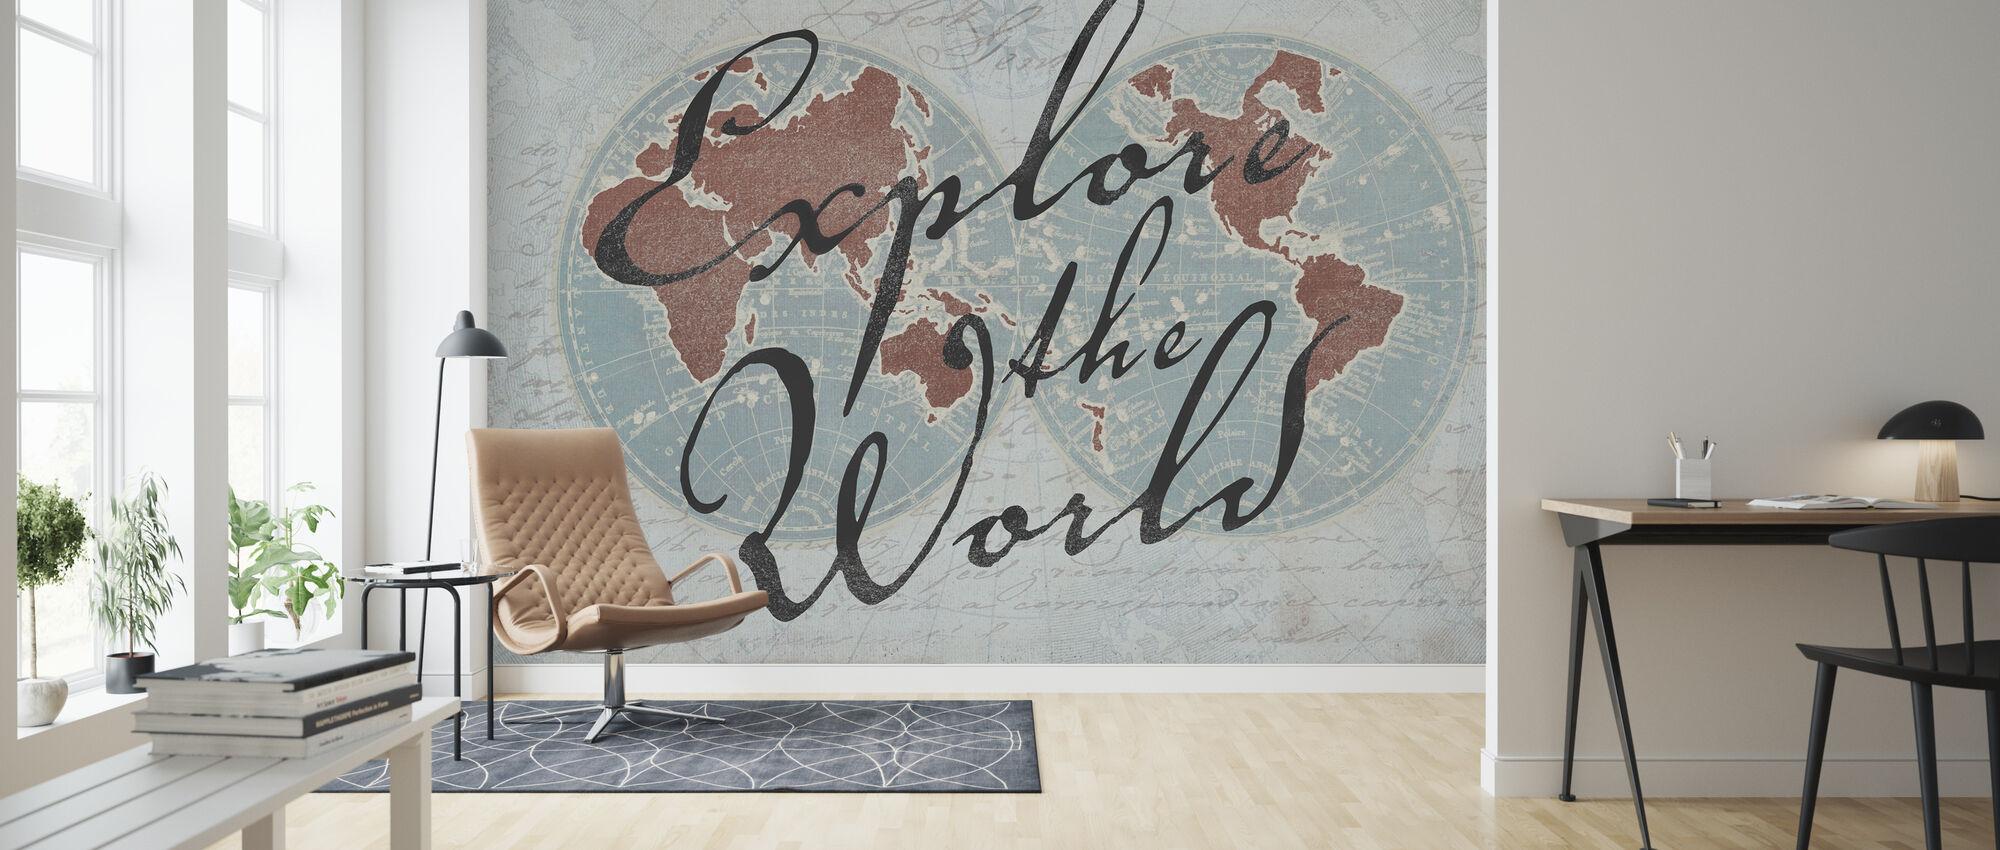 Explore the World 3 - Wallpaper - Living Room